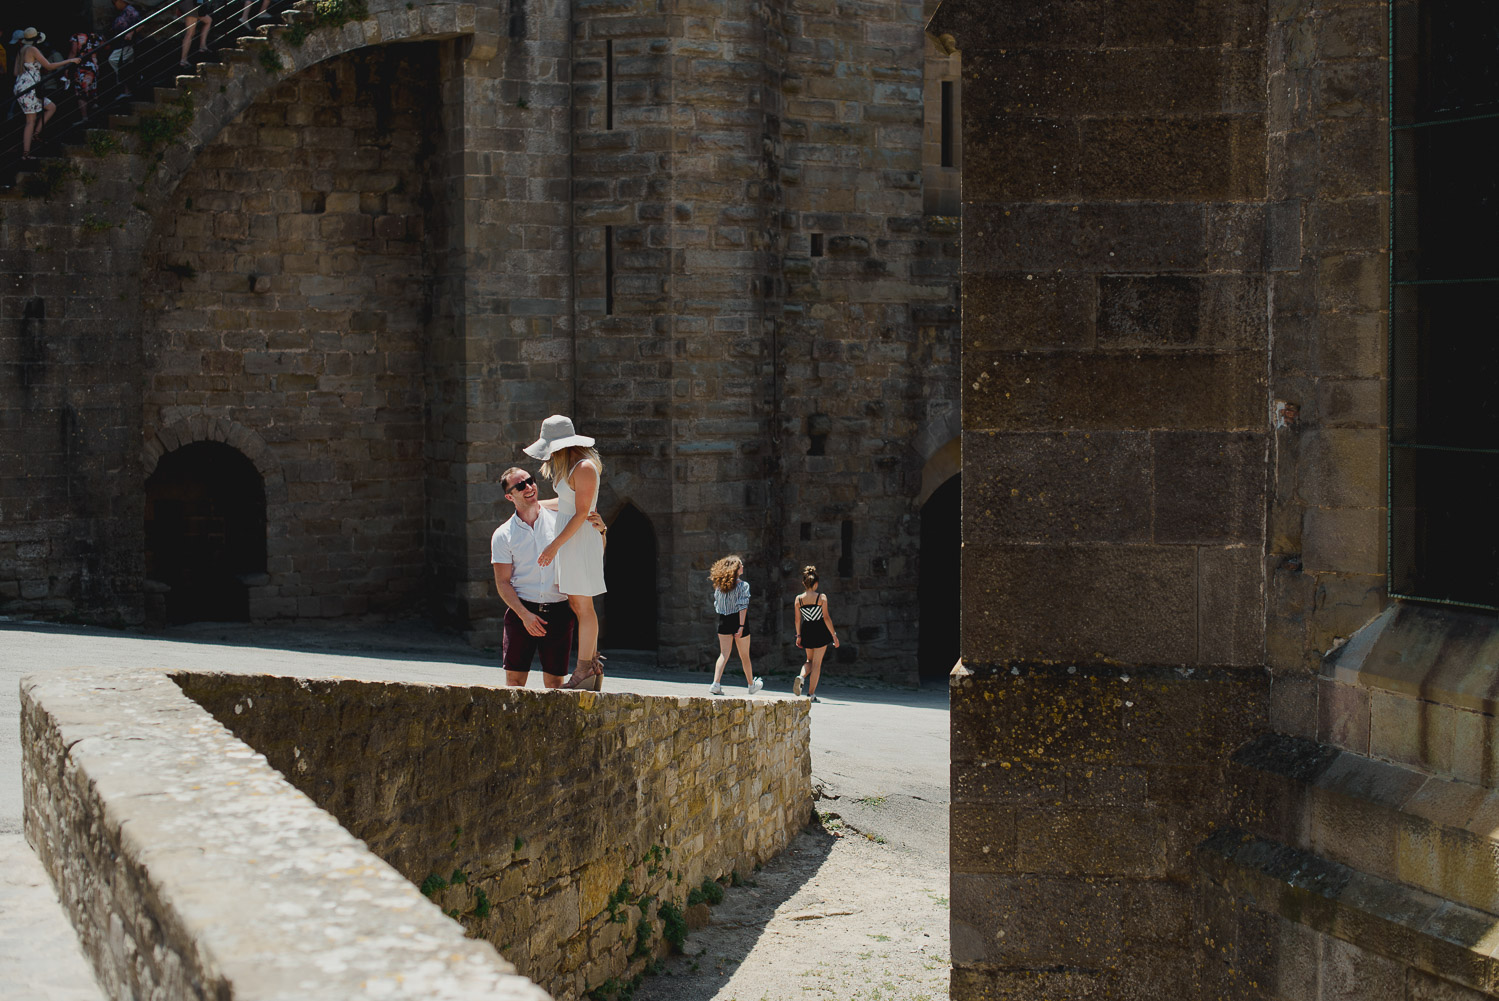 carcassonne_south_west_france_wedding_engagement_tarn_katy_webb_photography4